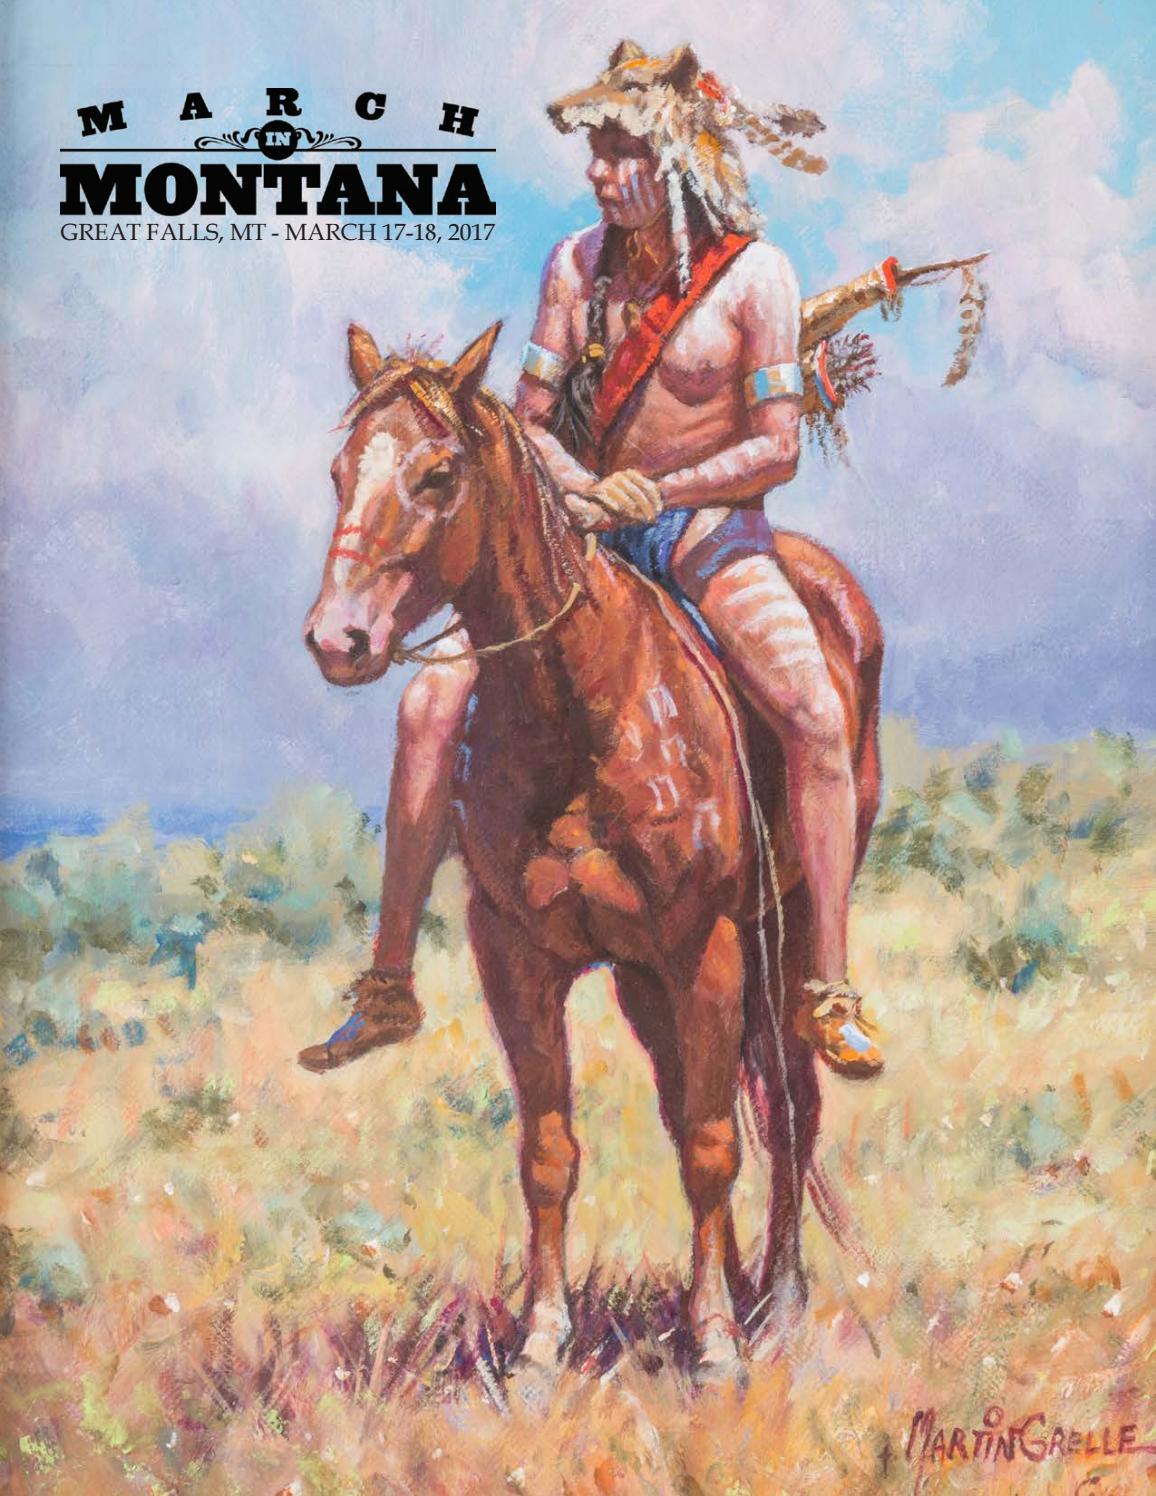 Wall Art HD Print Martin Grelle Canvas Painting Home Decor Indian Spear 12x16